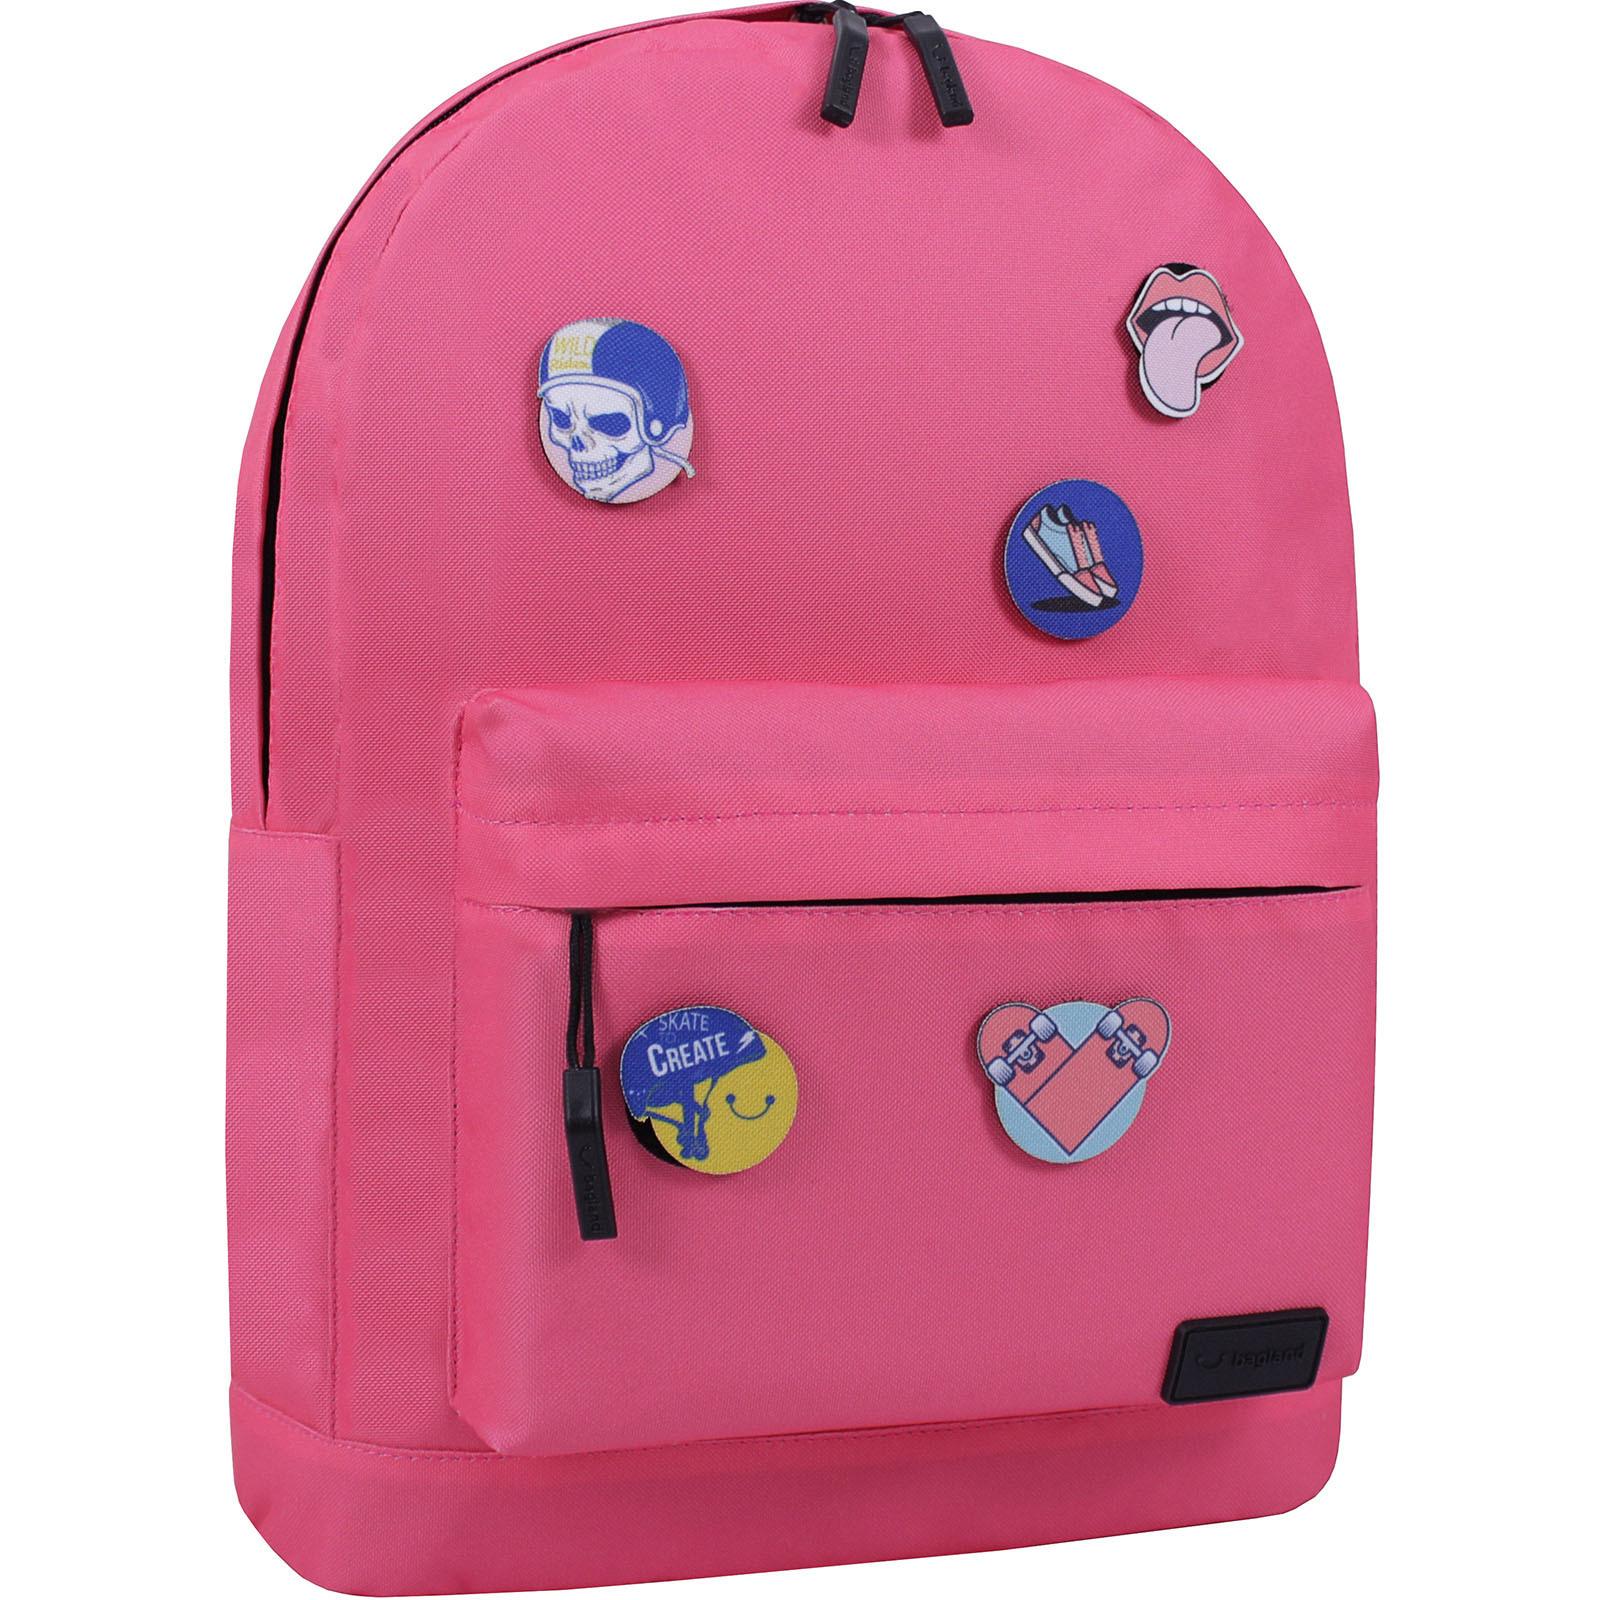 Молодежные рюкзаки Рюкзак Bagland Молодежный W/R 17 л. Розовый (00533664 Ш) IMG_1408.JPG